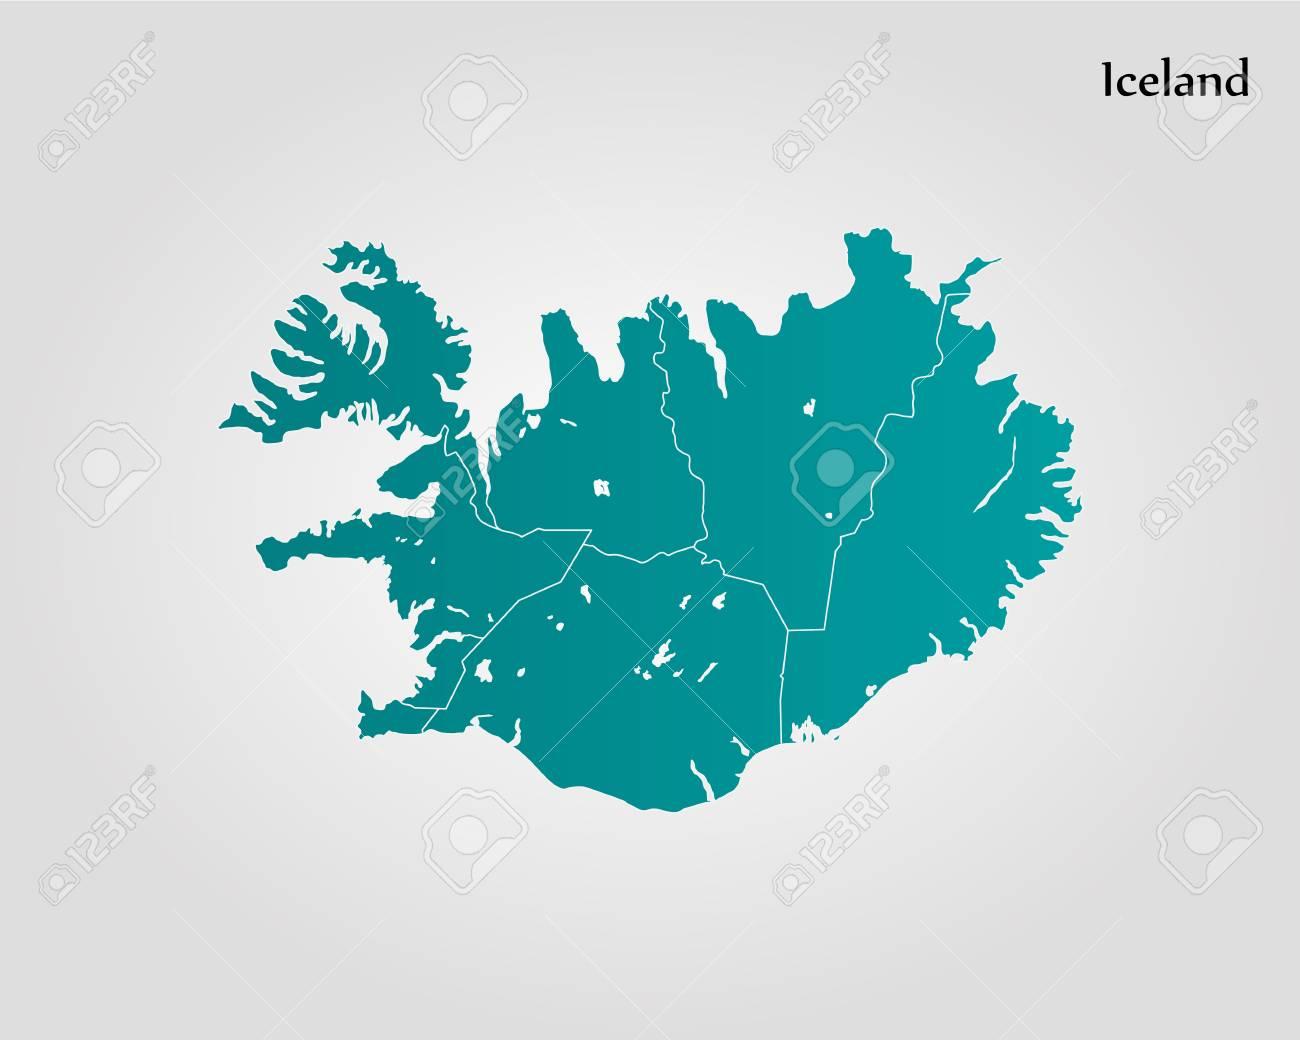 Map of Iceland. Vector illustration. World map Iceland Map World on western samoa world map, kazakhstan world map, panama world map, faroe islands, lesotho world map, sri lanka world map, united kingdom, new zealand, japan world map, indonesia world map, ireland world map, antartica world map, scotland world map, germany world map, india world map, british isles world map, cape verde world map, south korea world map, austria world map, guam world map, ceylon world map, norway world map, haiti world map,